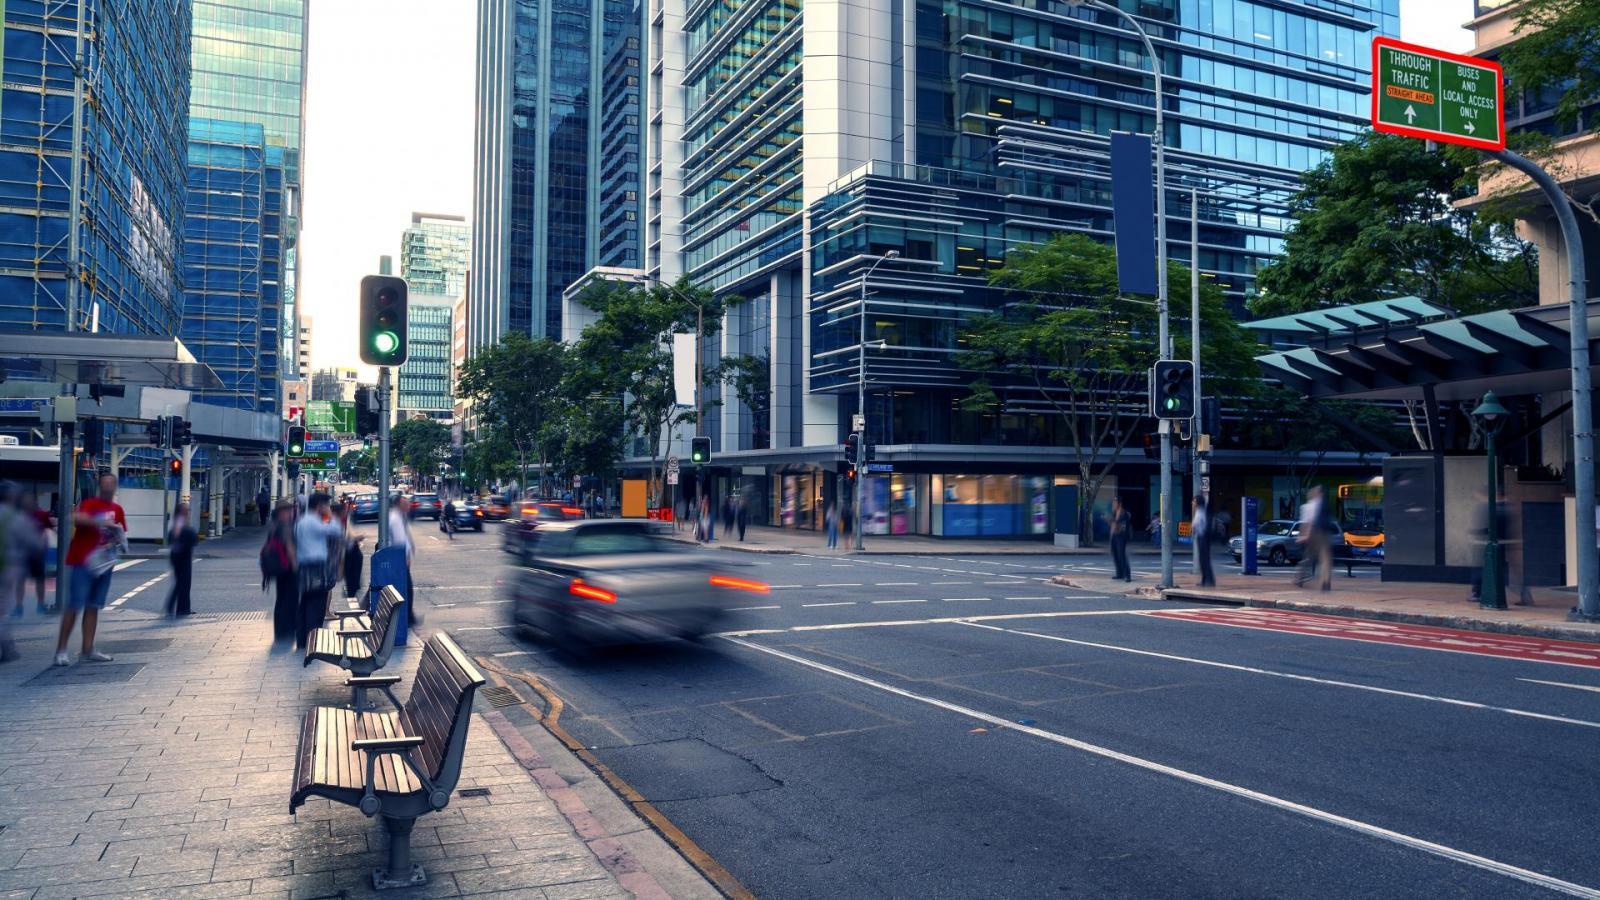 Brisbane Australien Queen Street